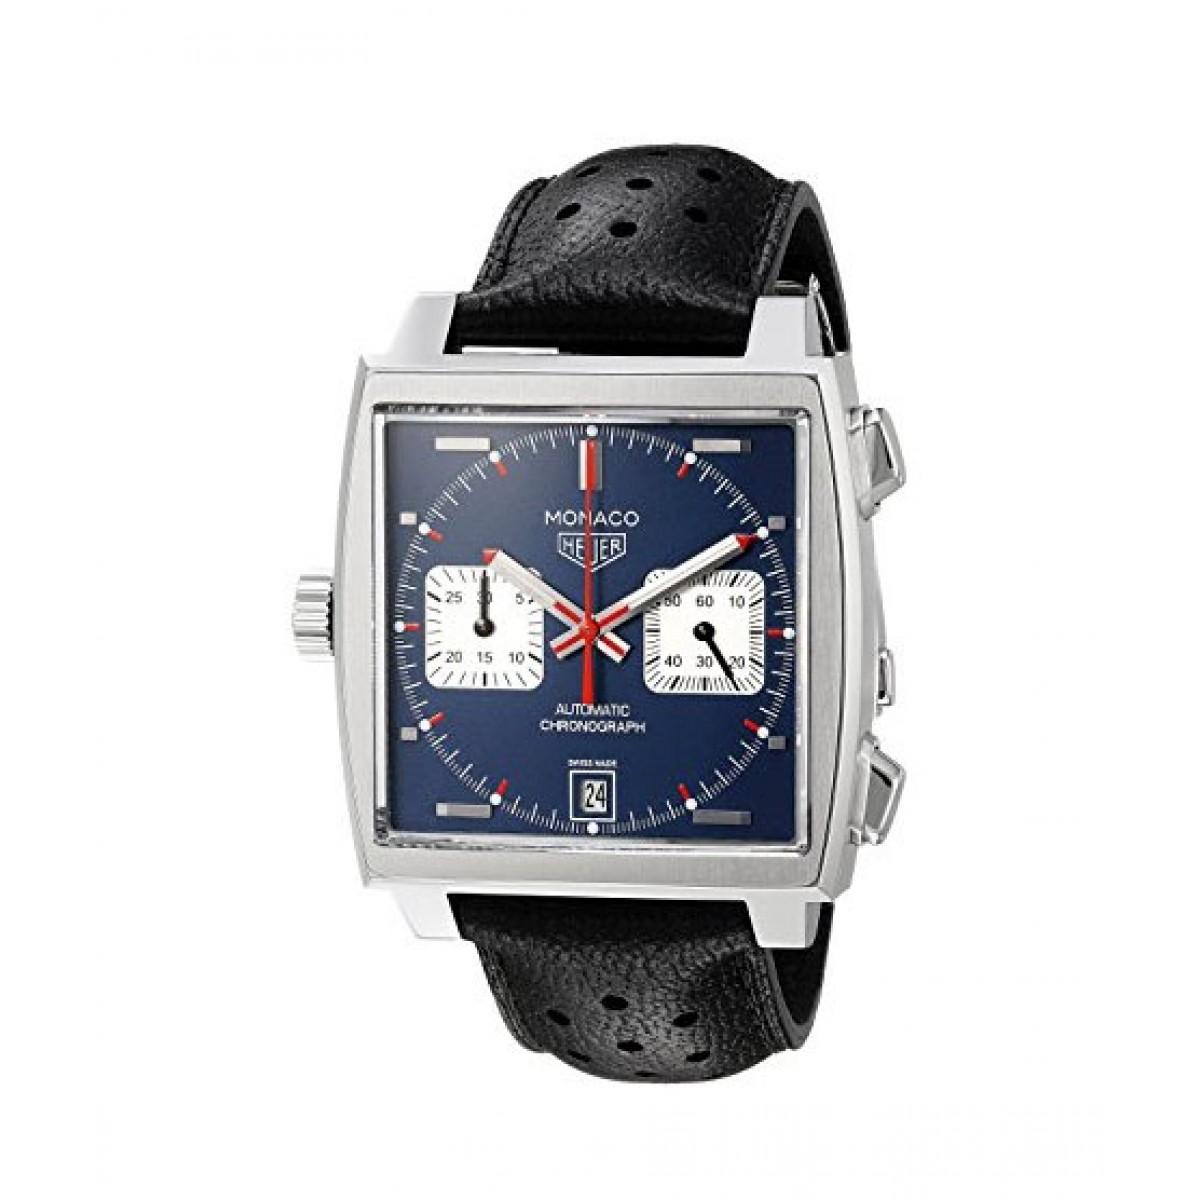 5192dfc2e6861 TAG Heuer Monaco Men s Watch Price in Pakistan